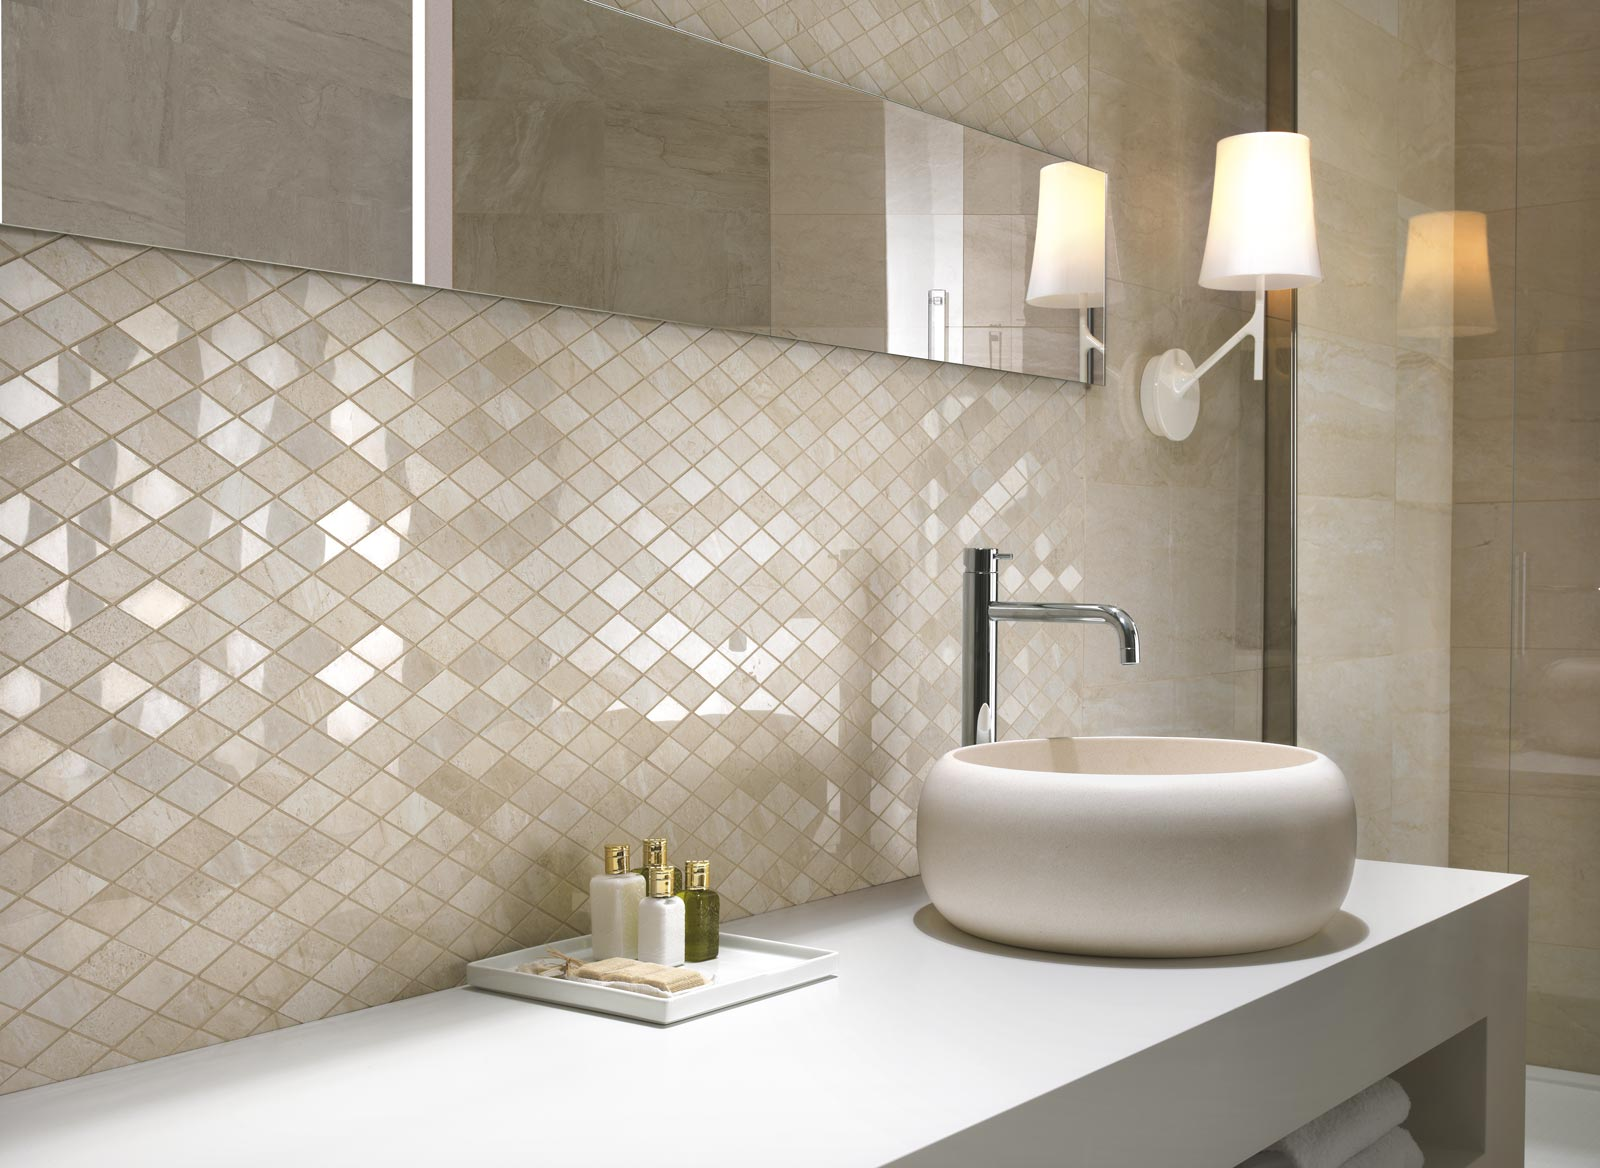 Azulejos Baño Gres Porcelanico:Bathrooms with Porcelain Tile Ragno